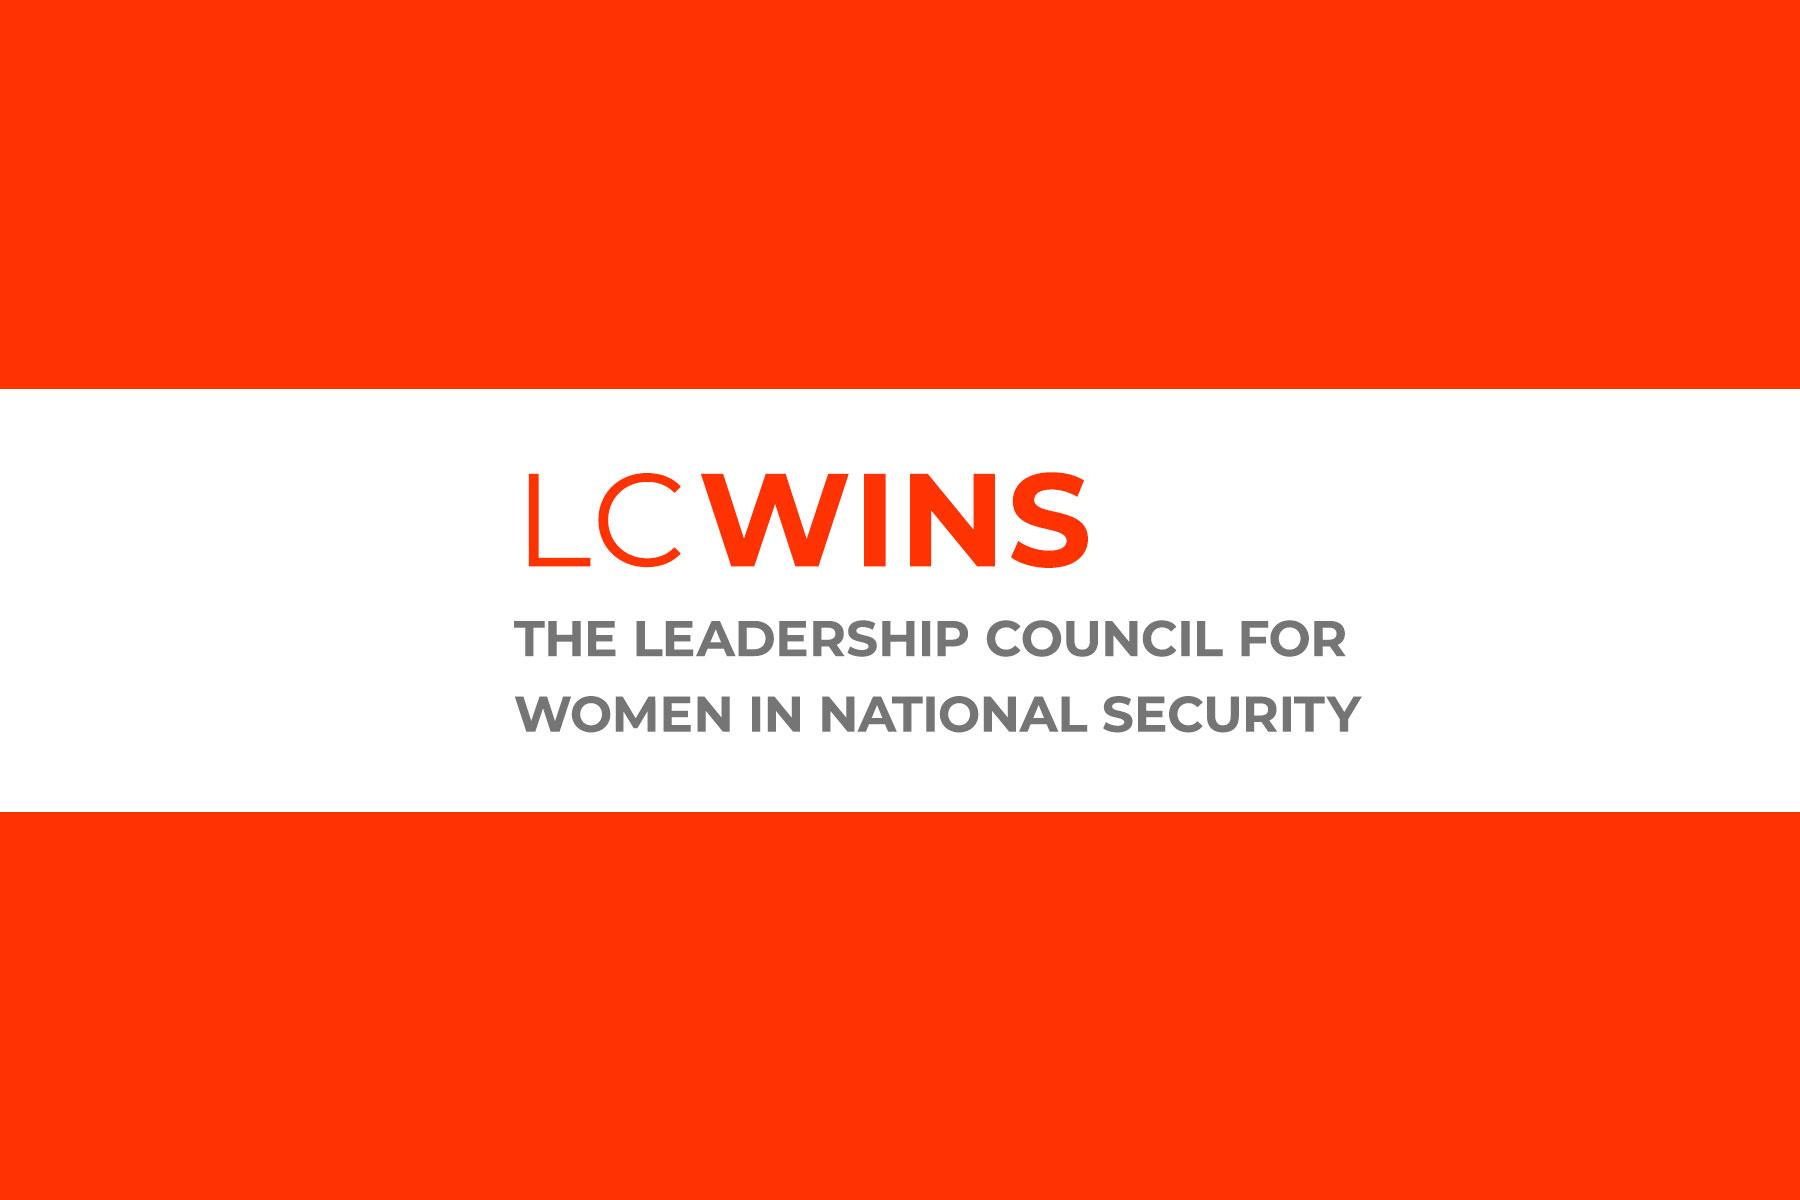 LCWINS logo